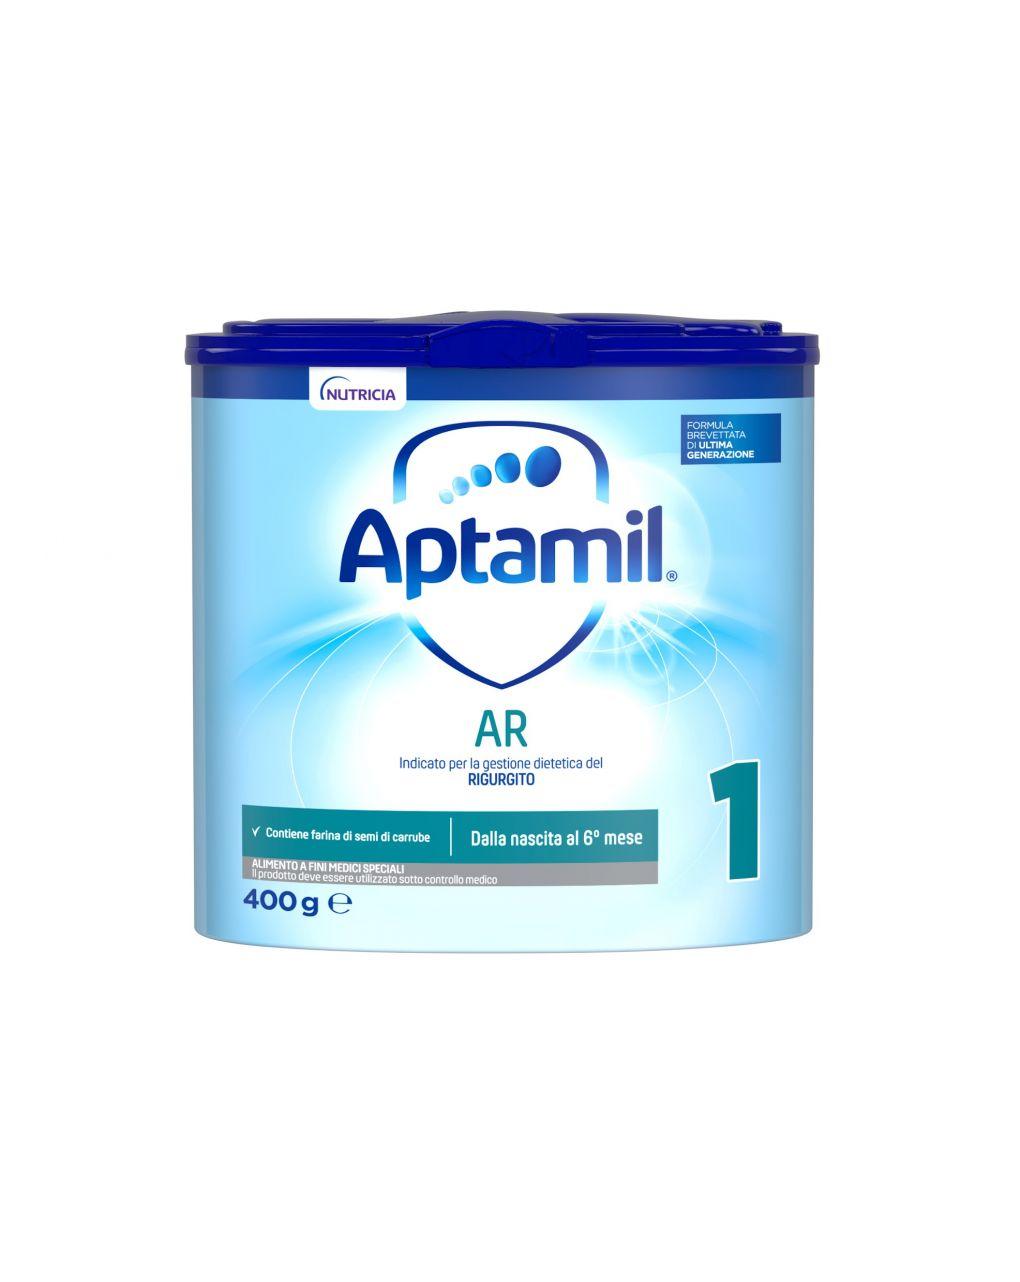 Aptamil - latte aptamil ar 1 polvere 400g - Aptamil